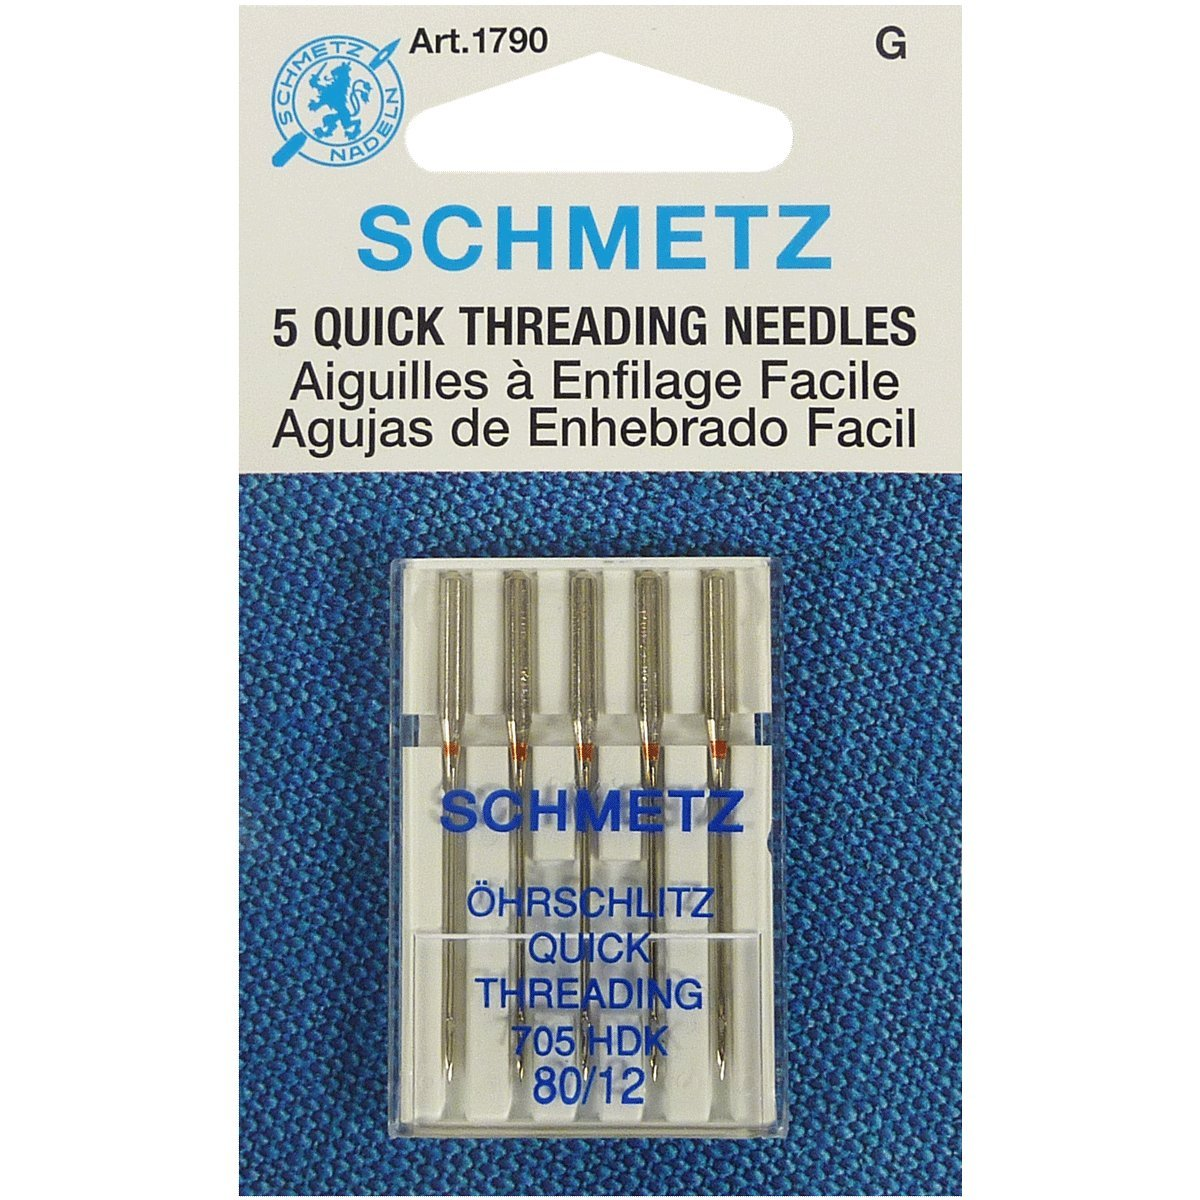 80//12 Quick Threading Sewing Needle Schmetz